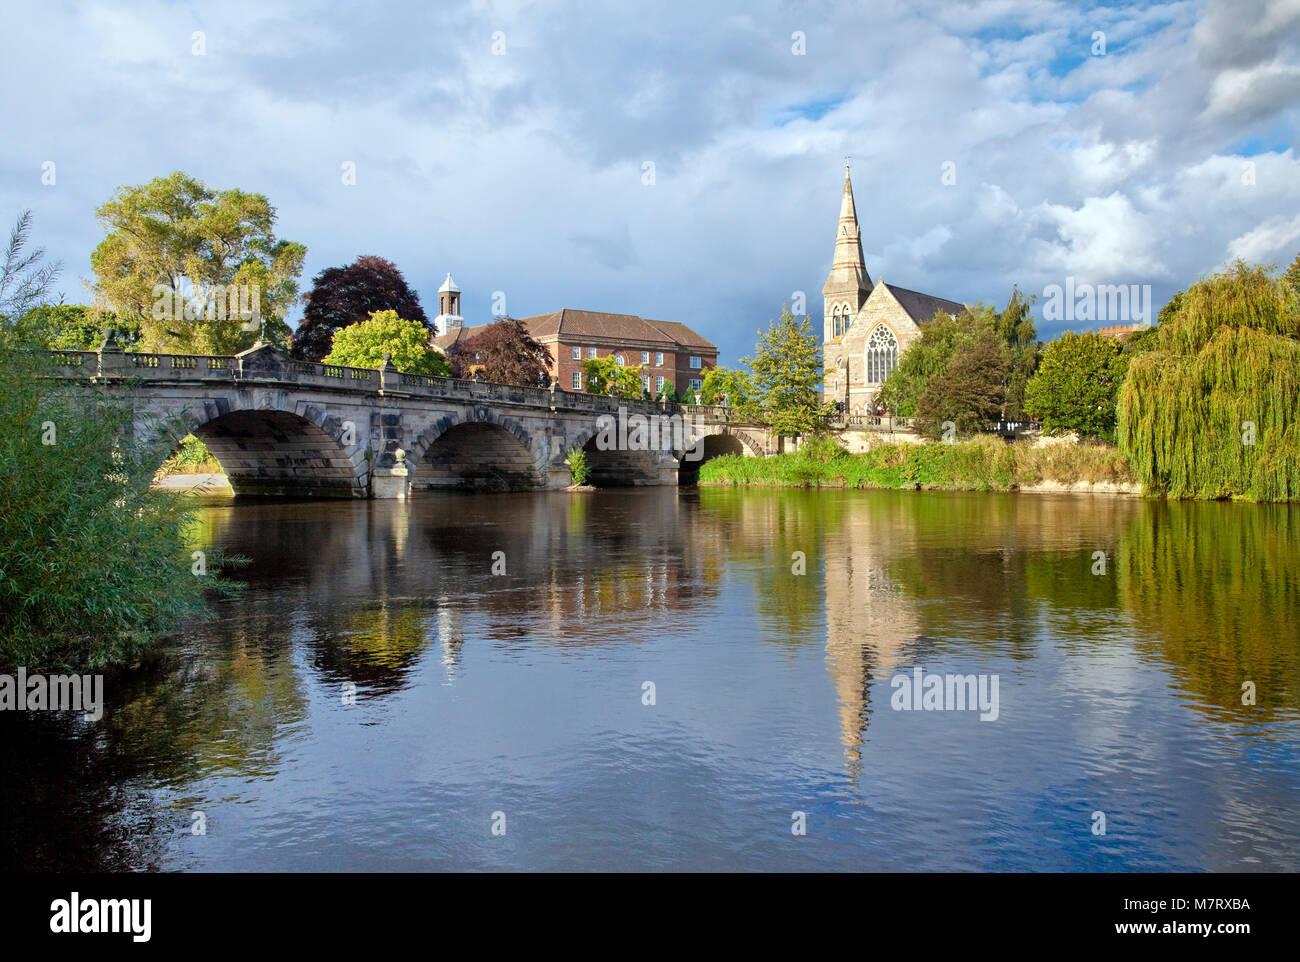 River Severn by English Bridge and United Reform Church Shrewsbury Shropshire - Stock Image